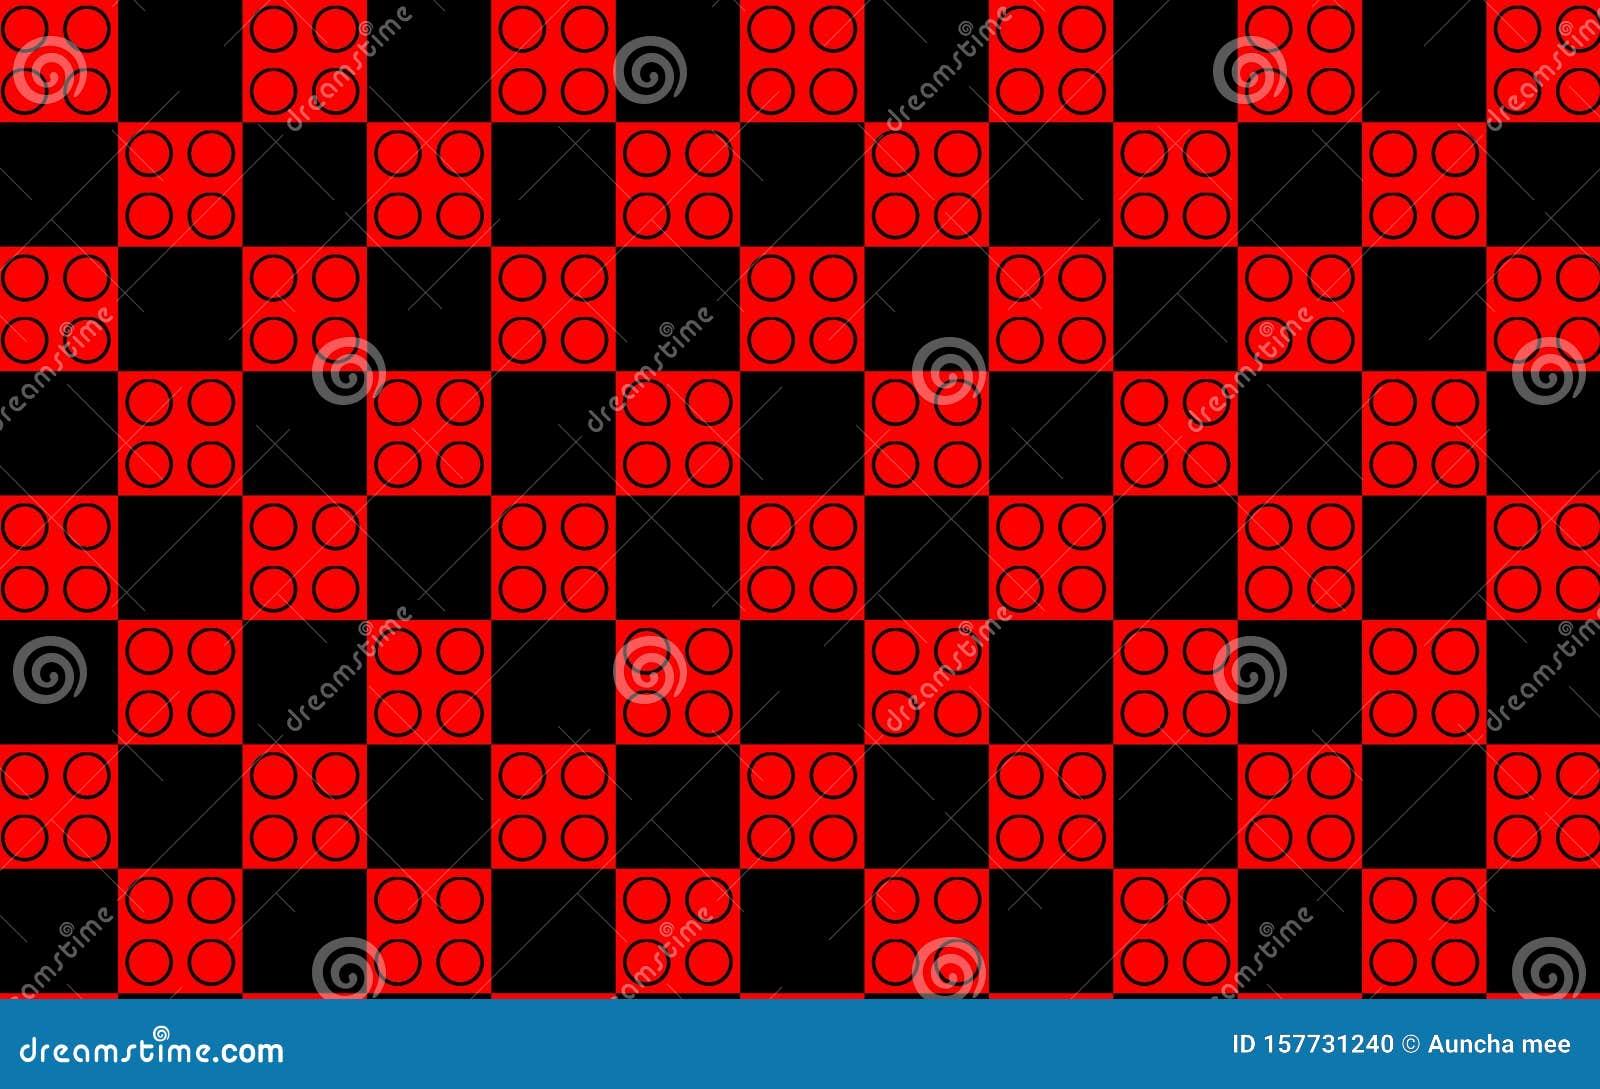 black red lego background illustration design black red lego background illustration design block wall color creative 157731240